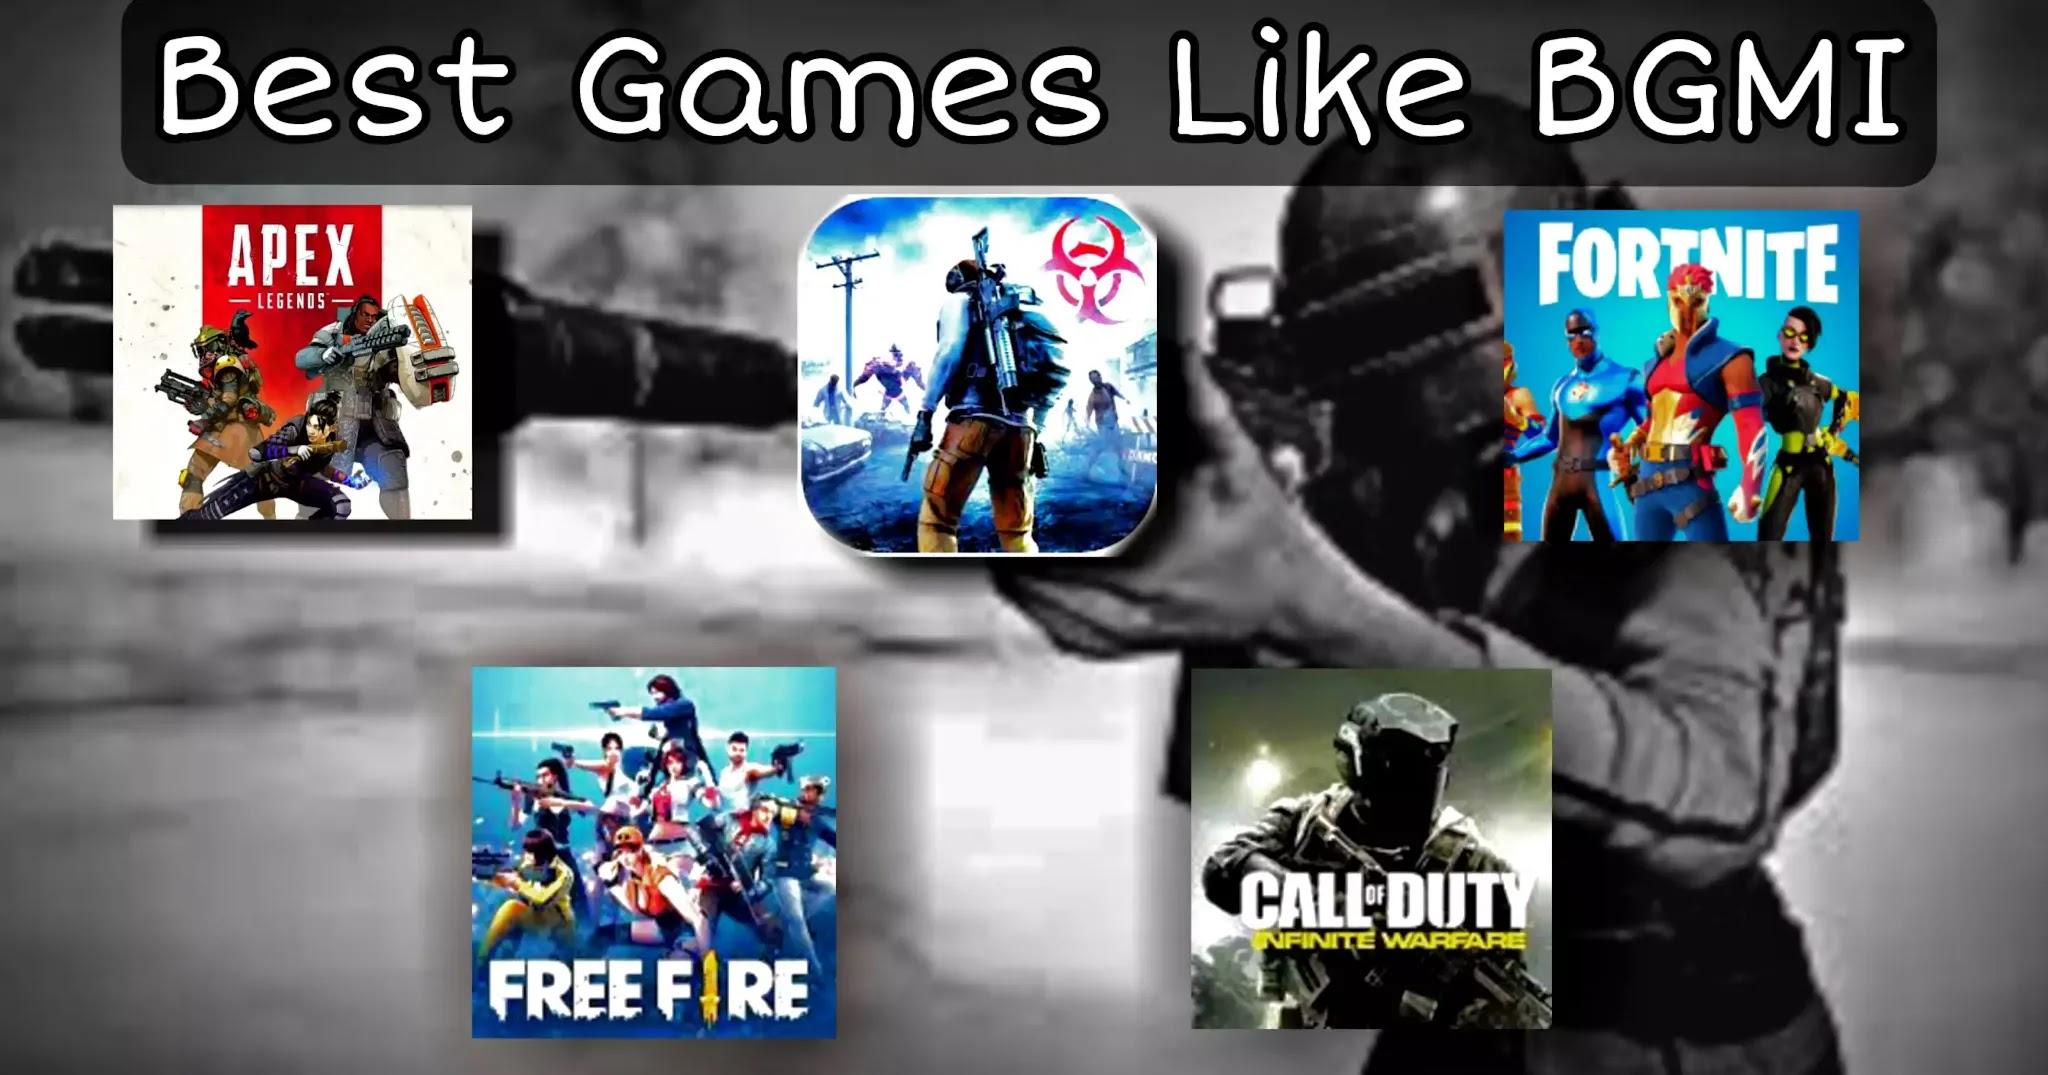 Best Games like Pubg BGMI